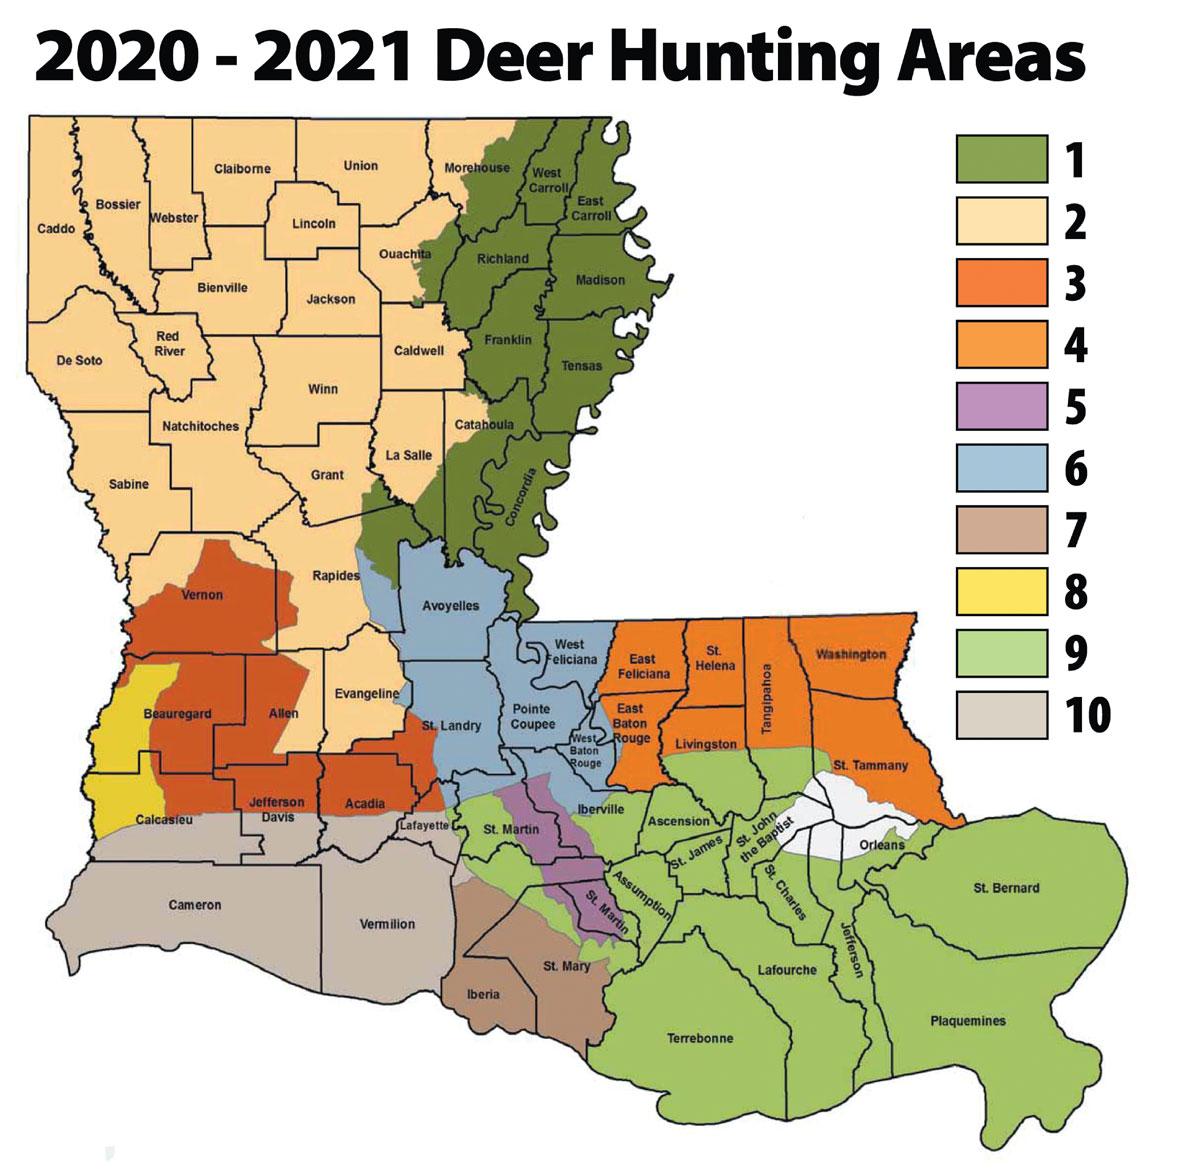 Louisiana'S 2020 Rut Report - Louisiana Sportsman regarding Rut Whitetail 2021